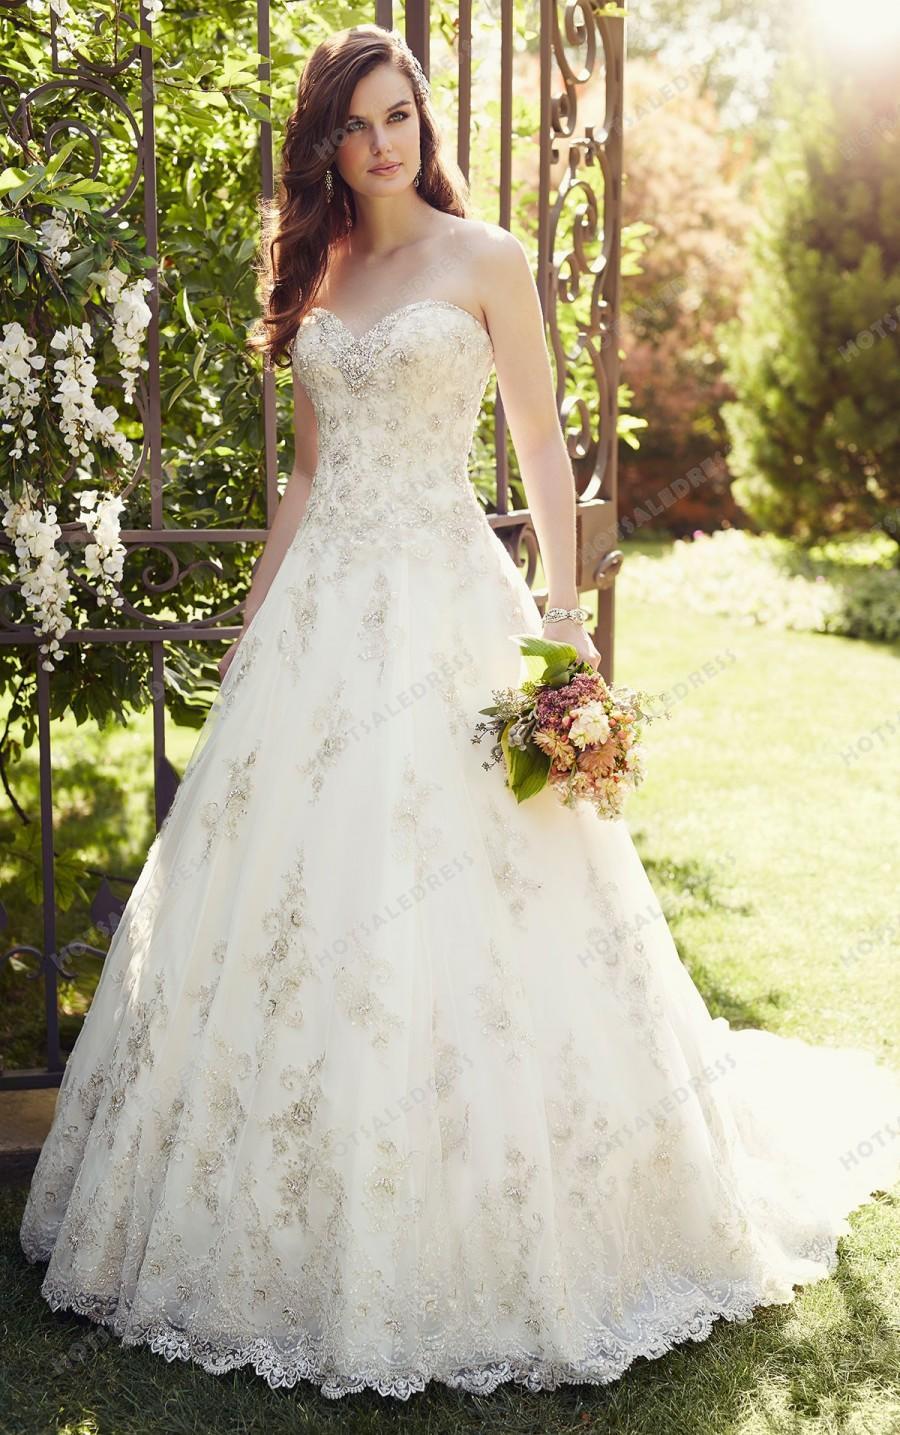 Hochzeit - Essense of Australia A-Line Wedding Dress Style D1757